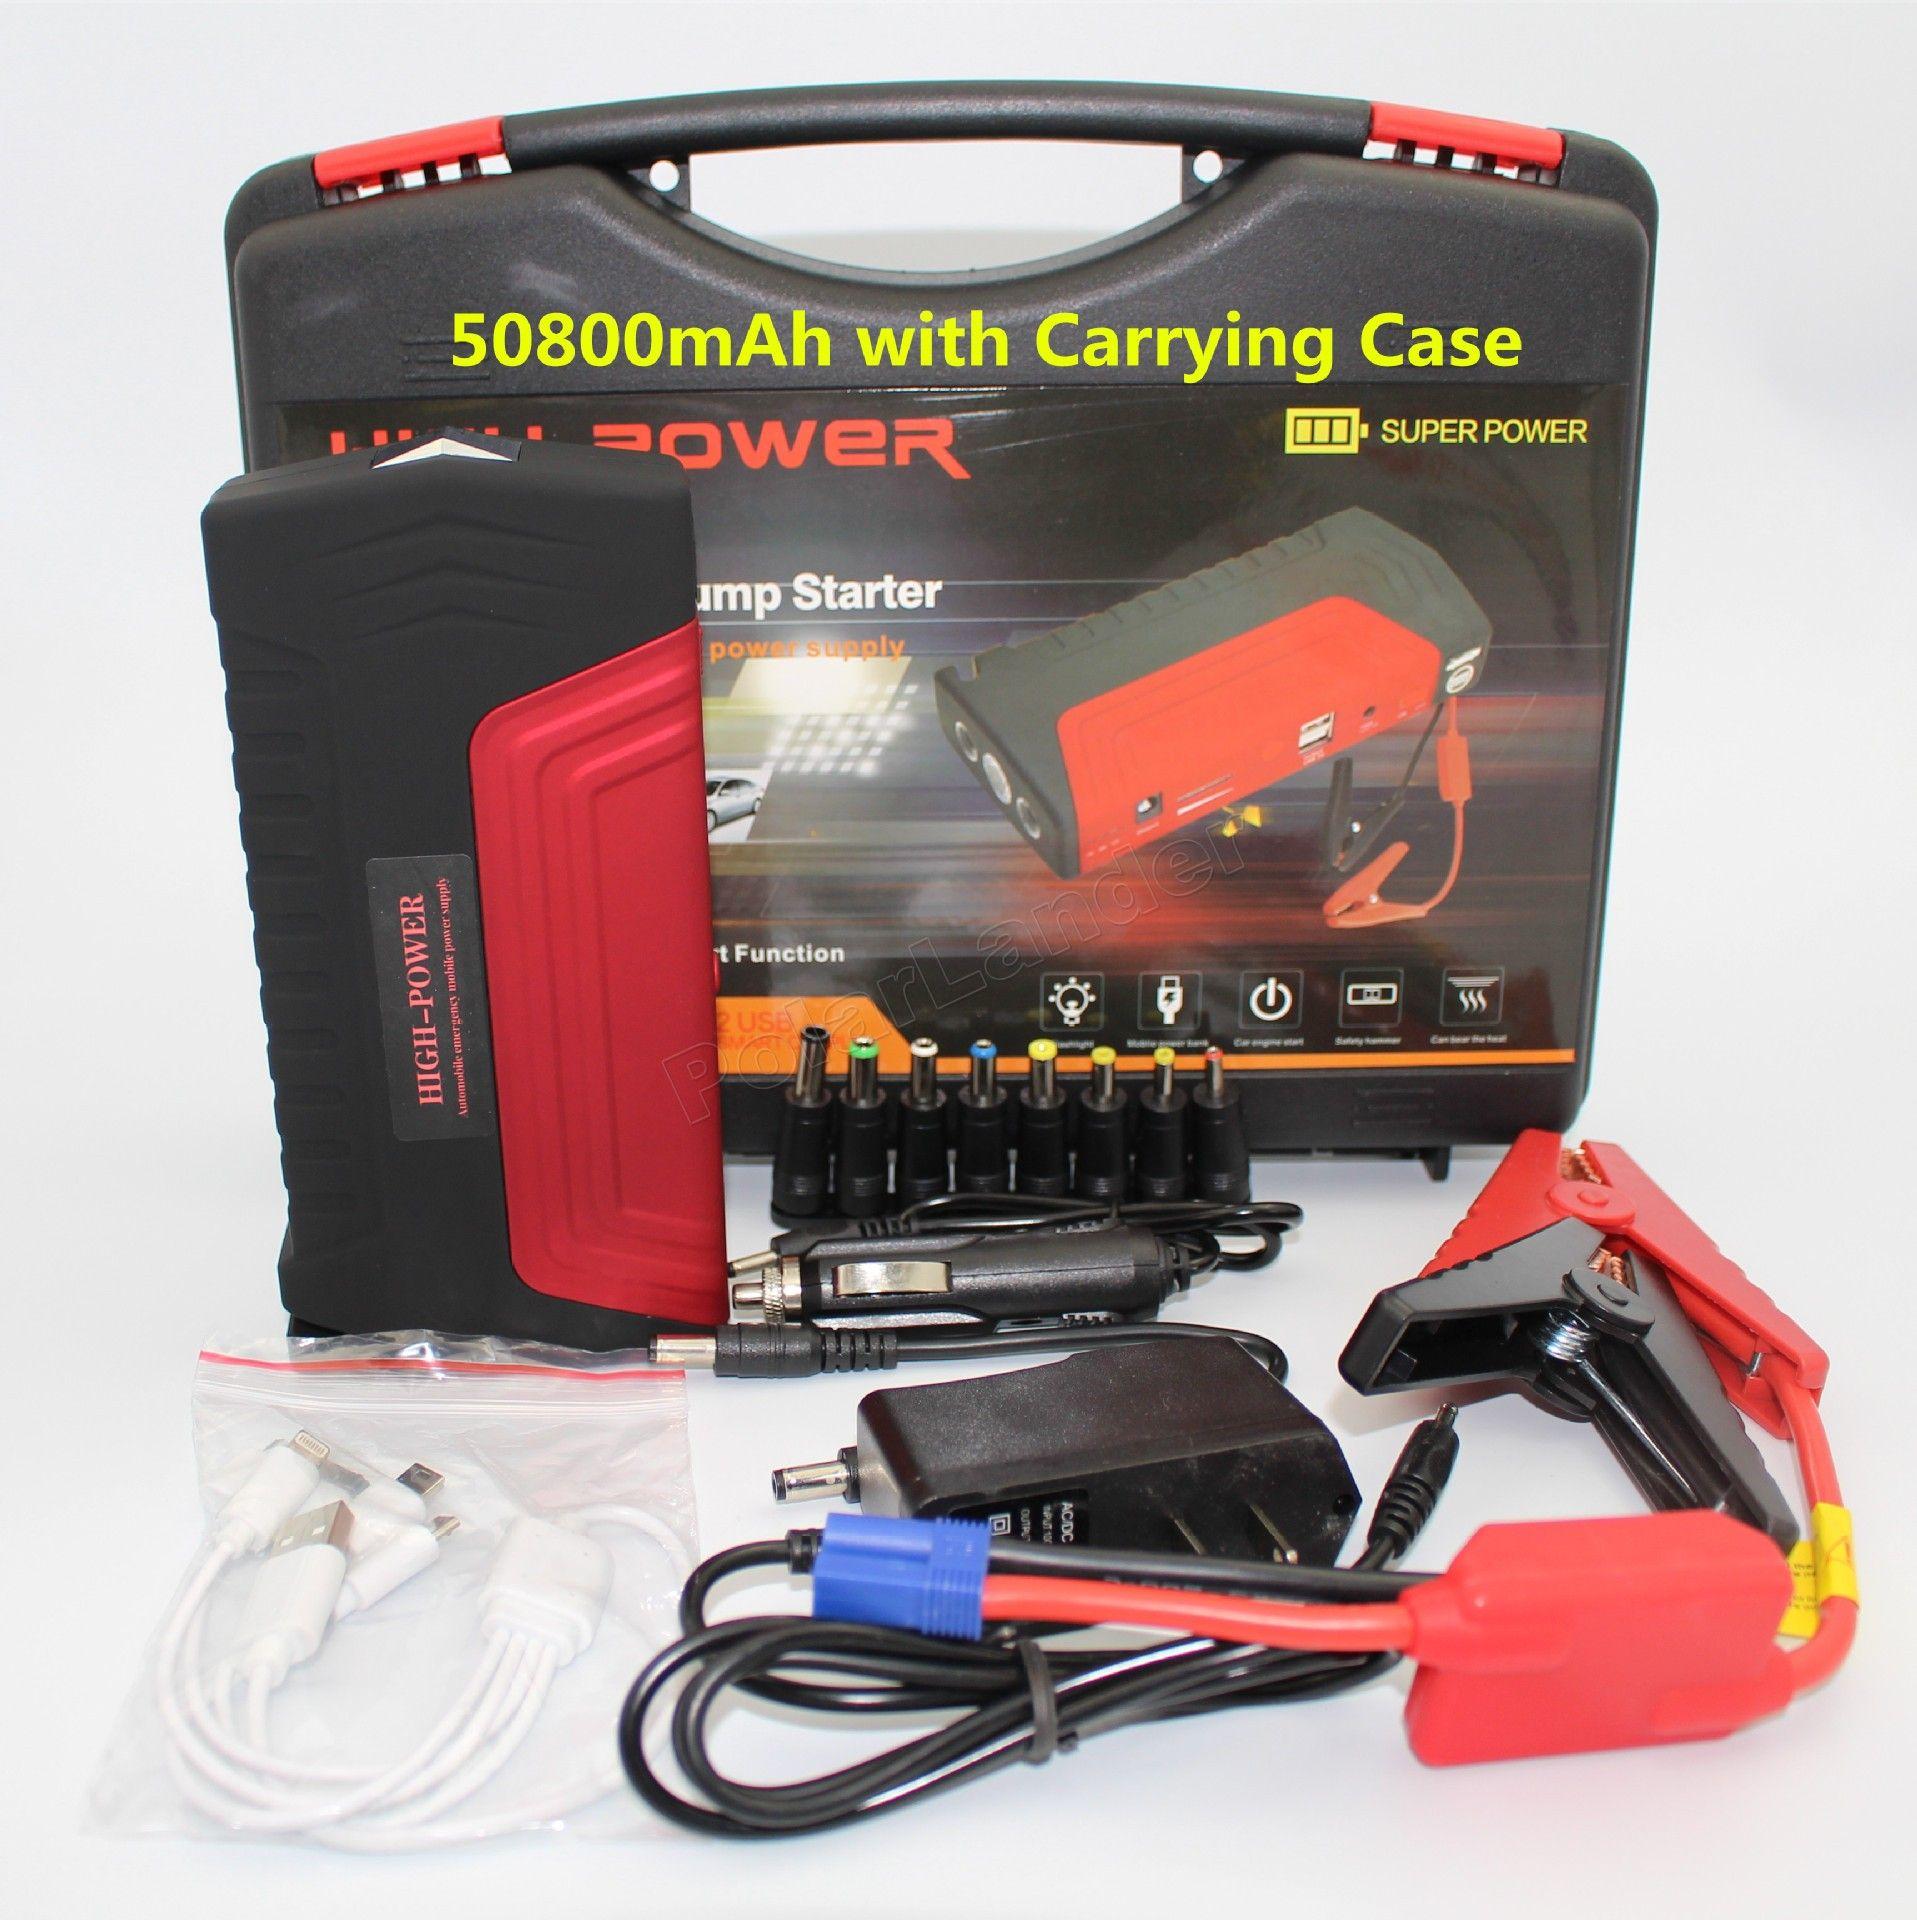 Hot Sale Red 2 Usb Port Multi Function Portable 50800mah Car Jump Starter Emergency Power Emergency Auto Start Bank Emergency Power Car Electronics Auto Start